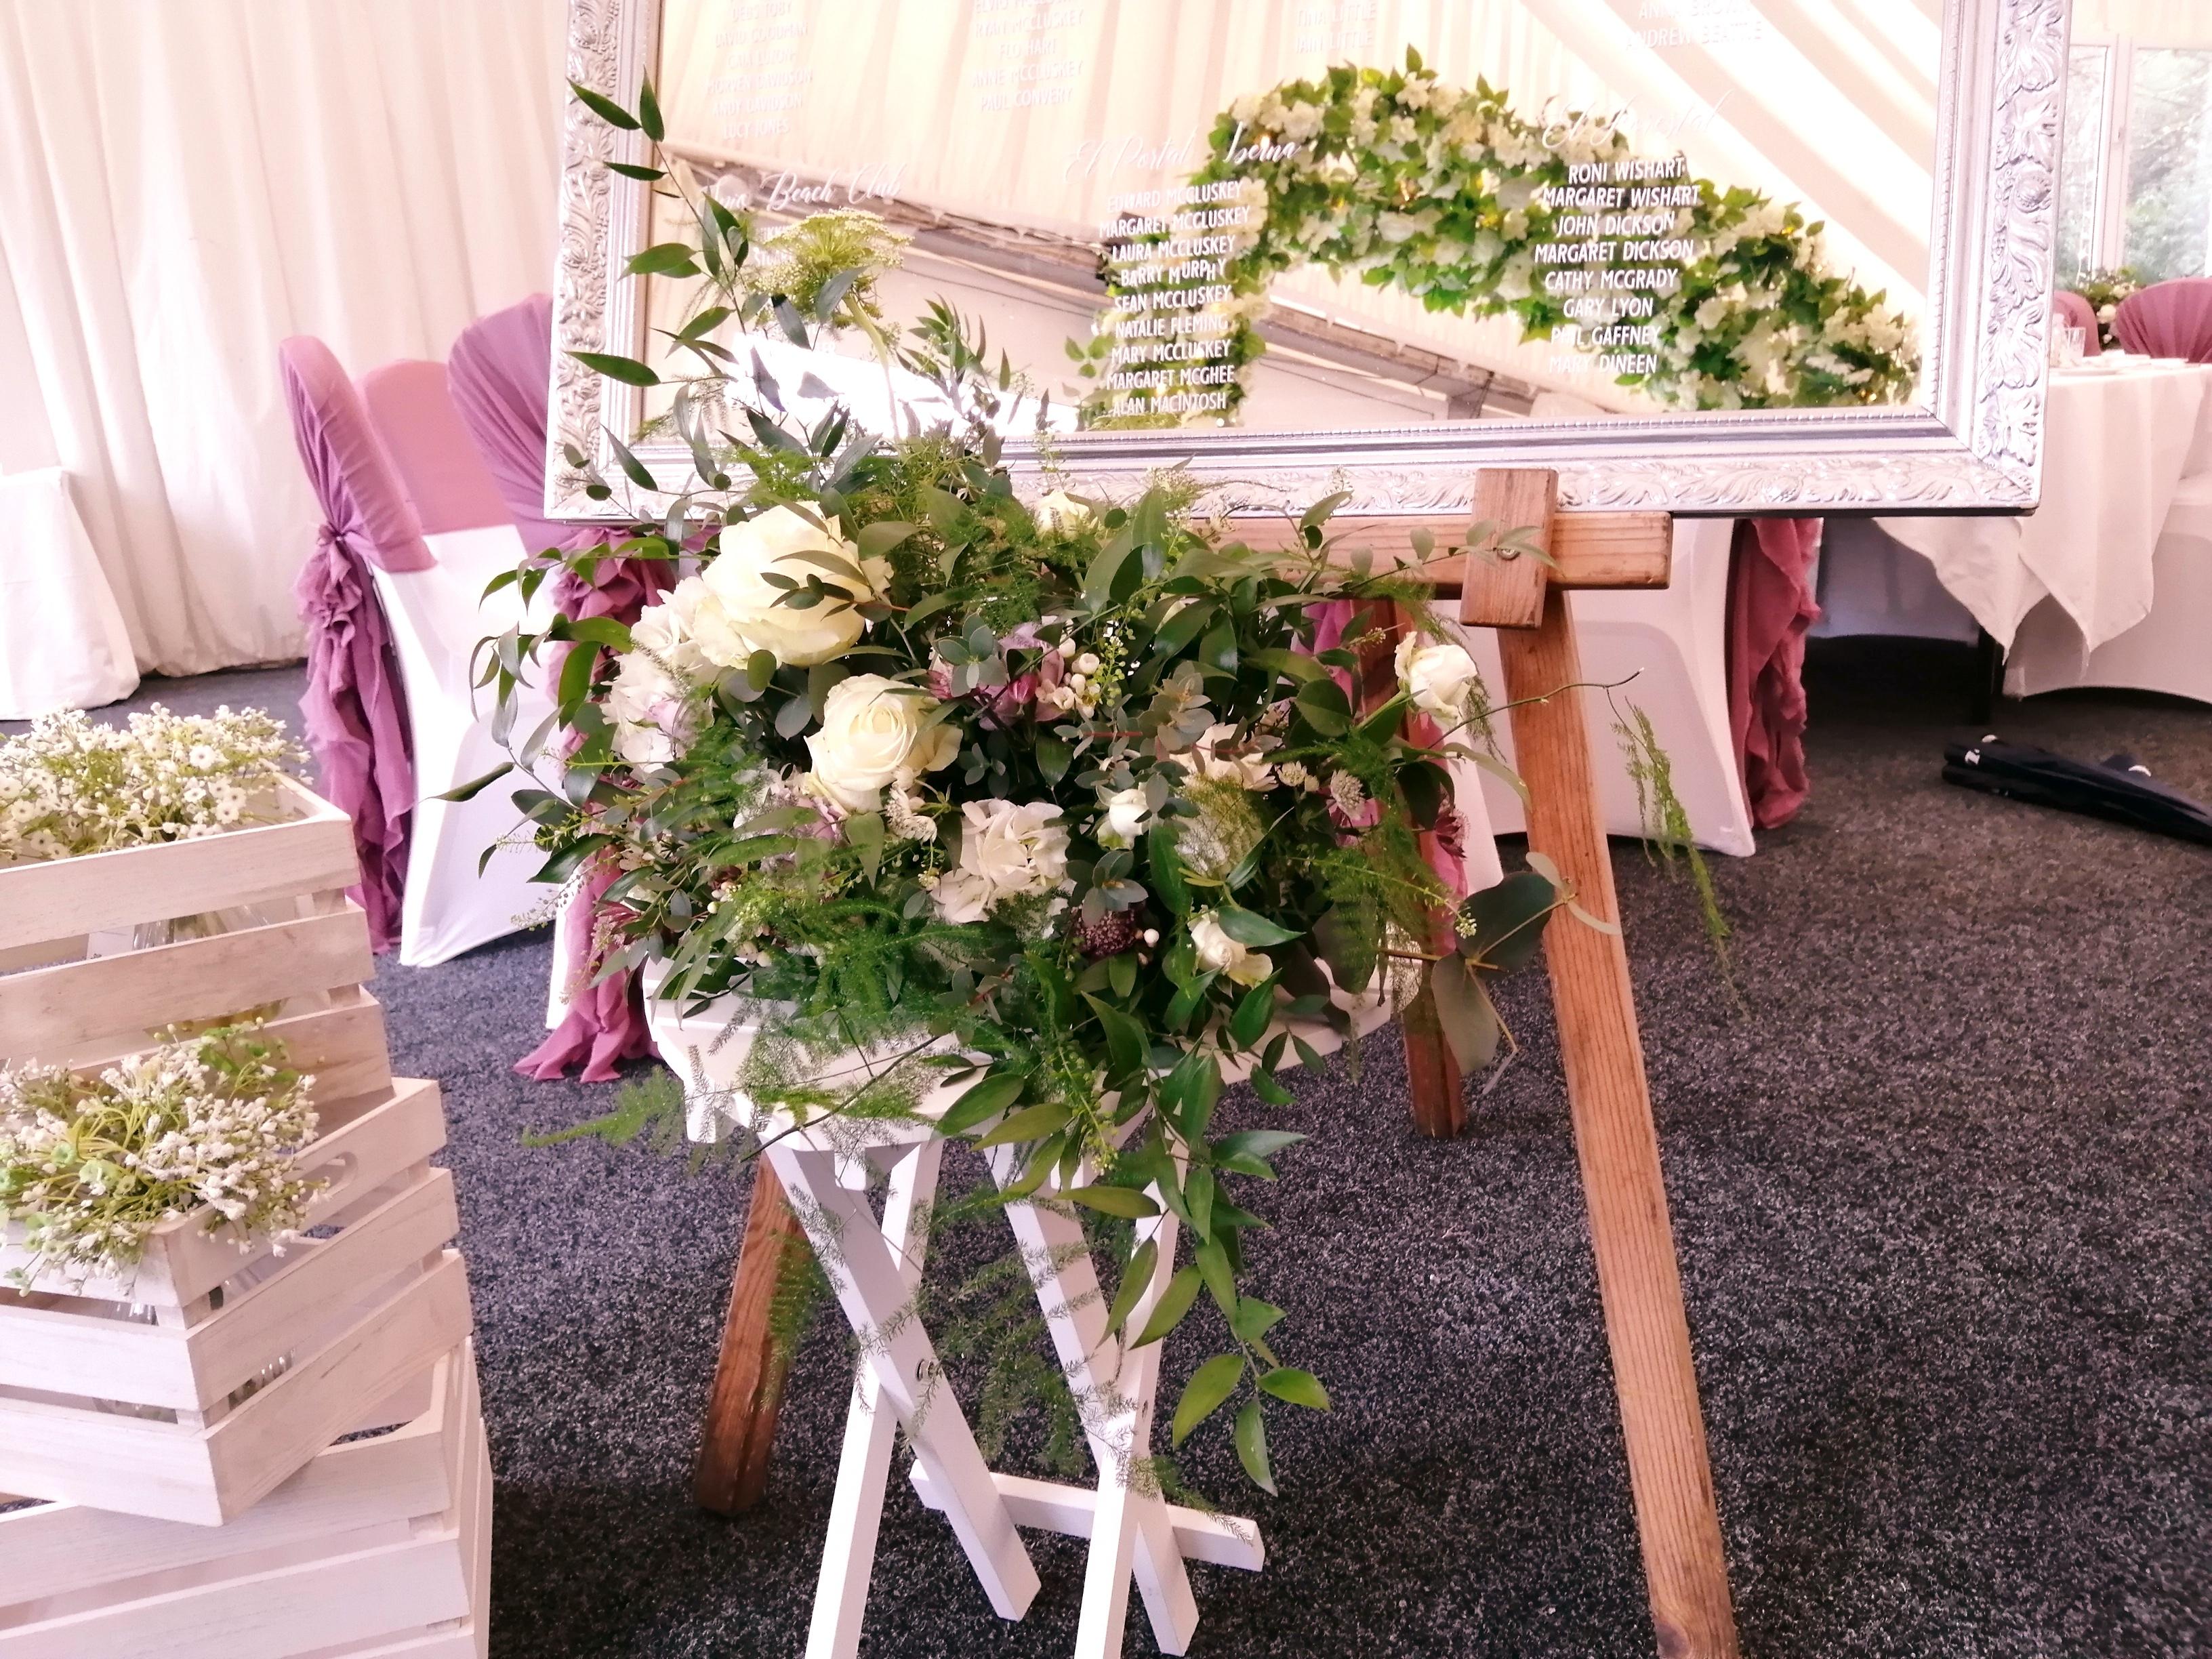 Heart Table displaying a floral arrangem